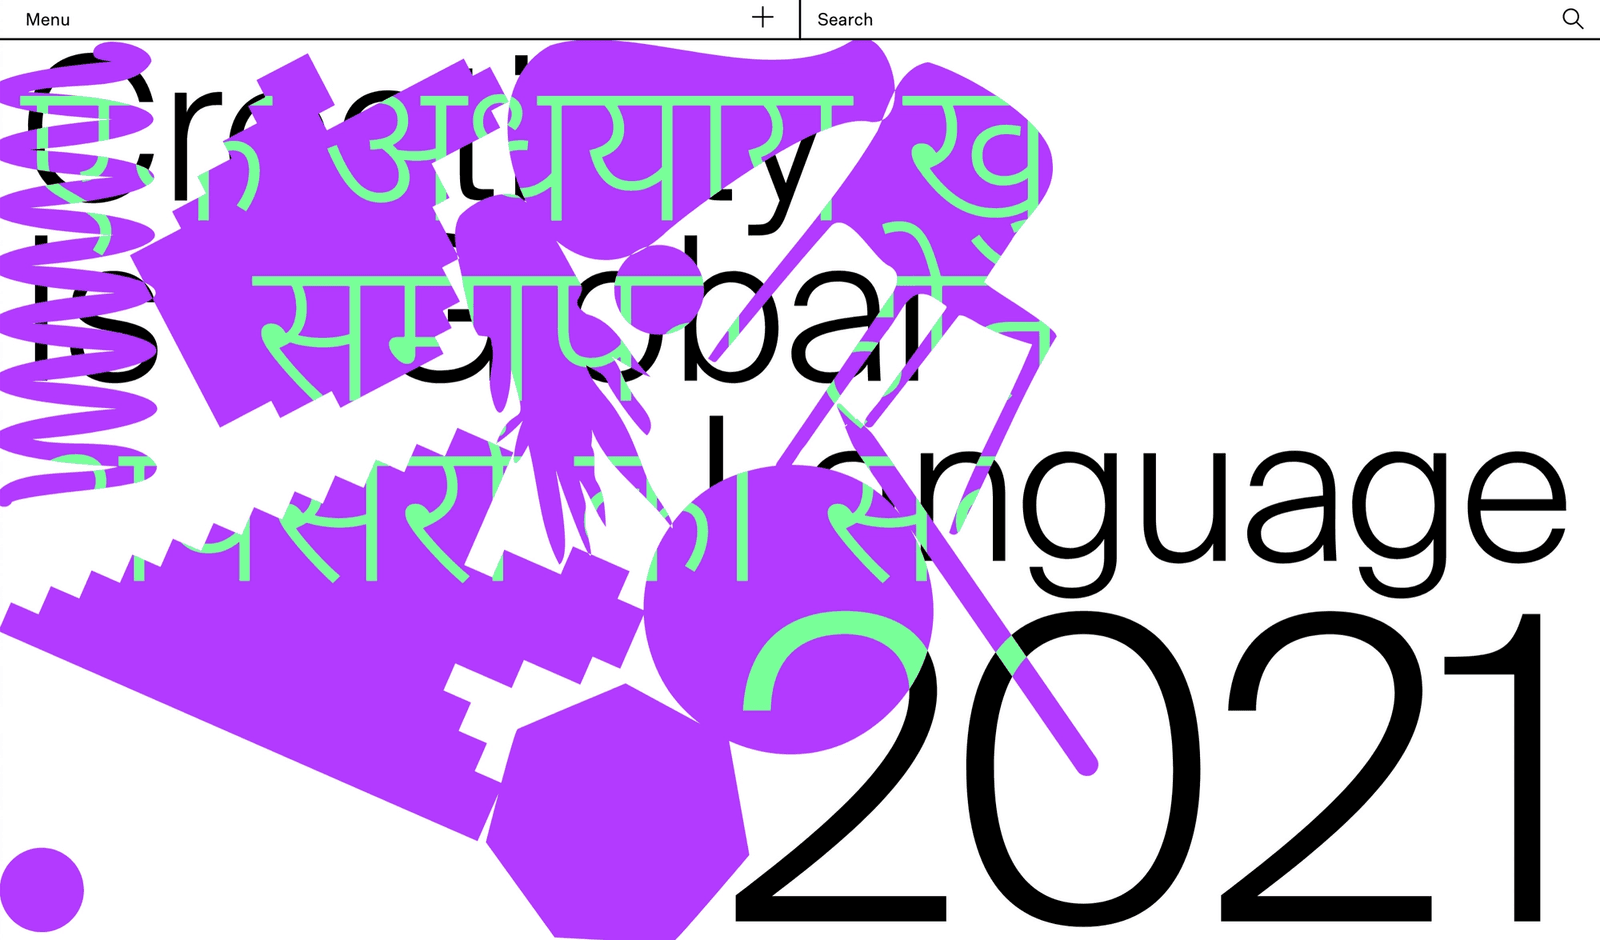 Royal College of Art 2021 website